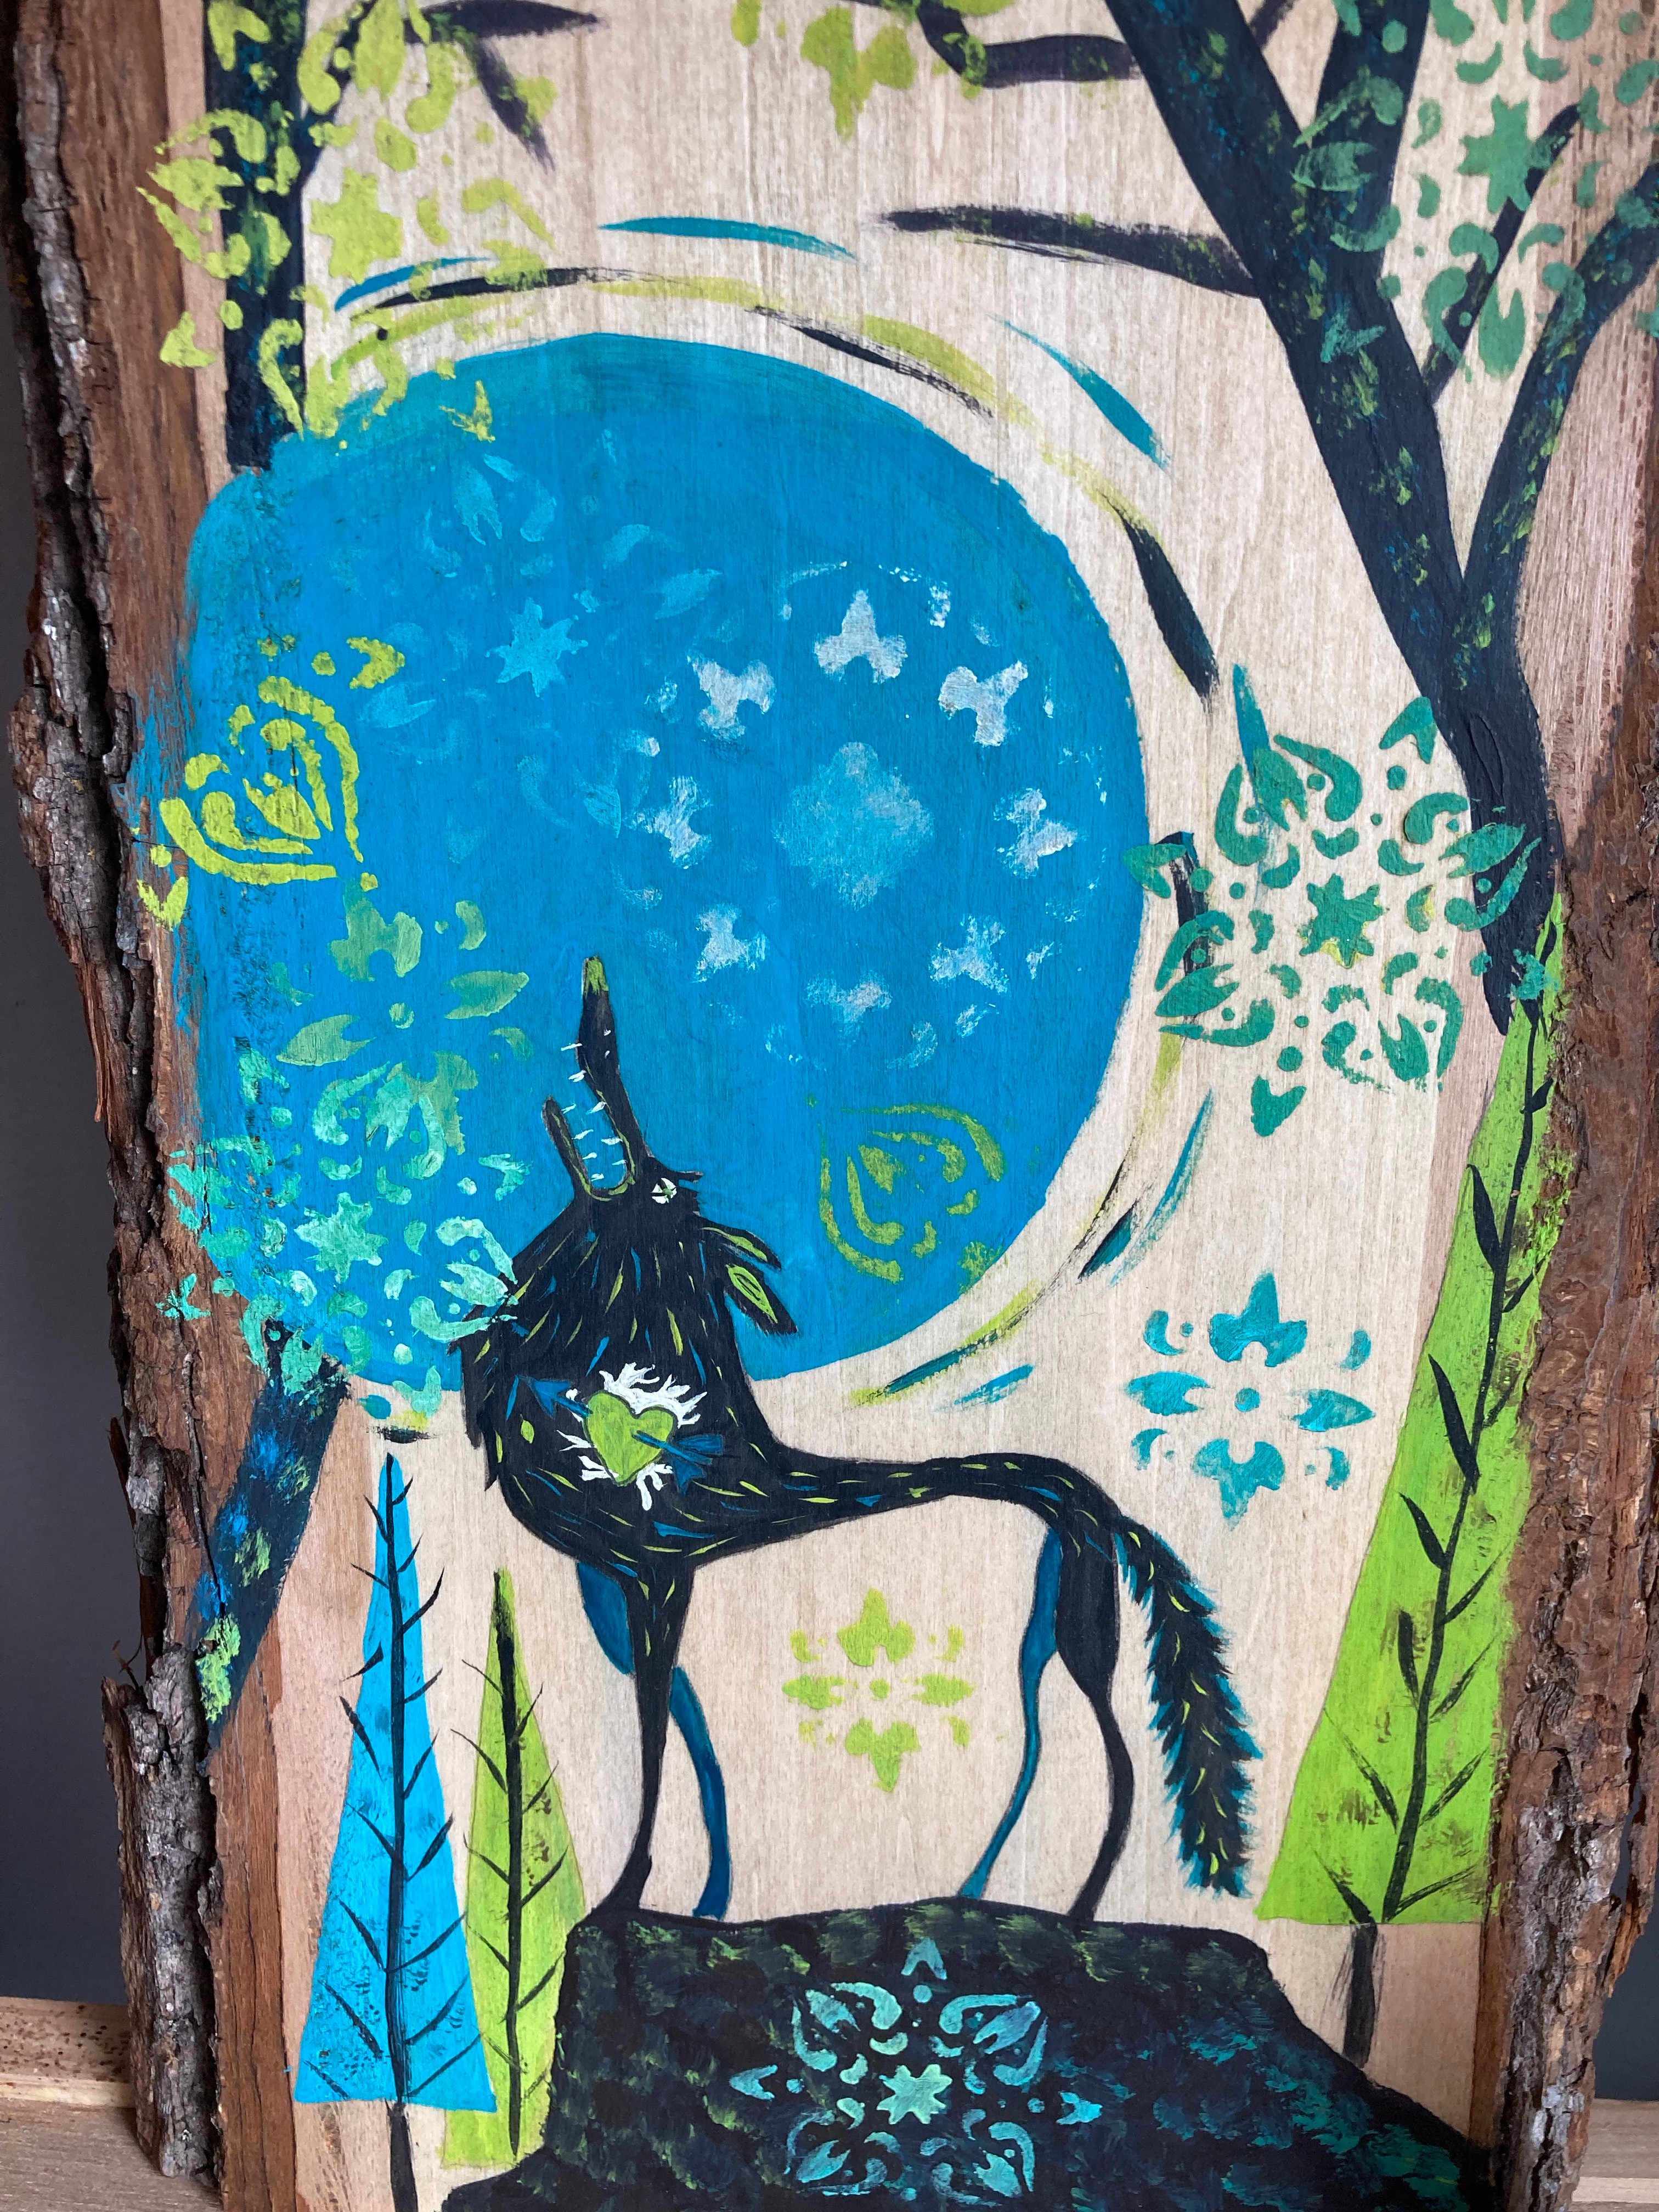 Woodland Creatures Wolf  9/25 @ 11:24am